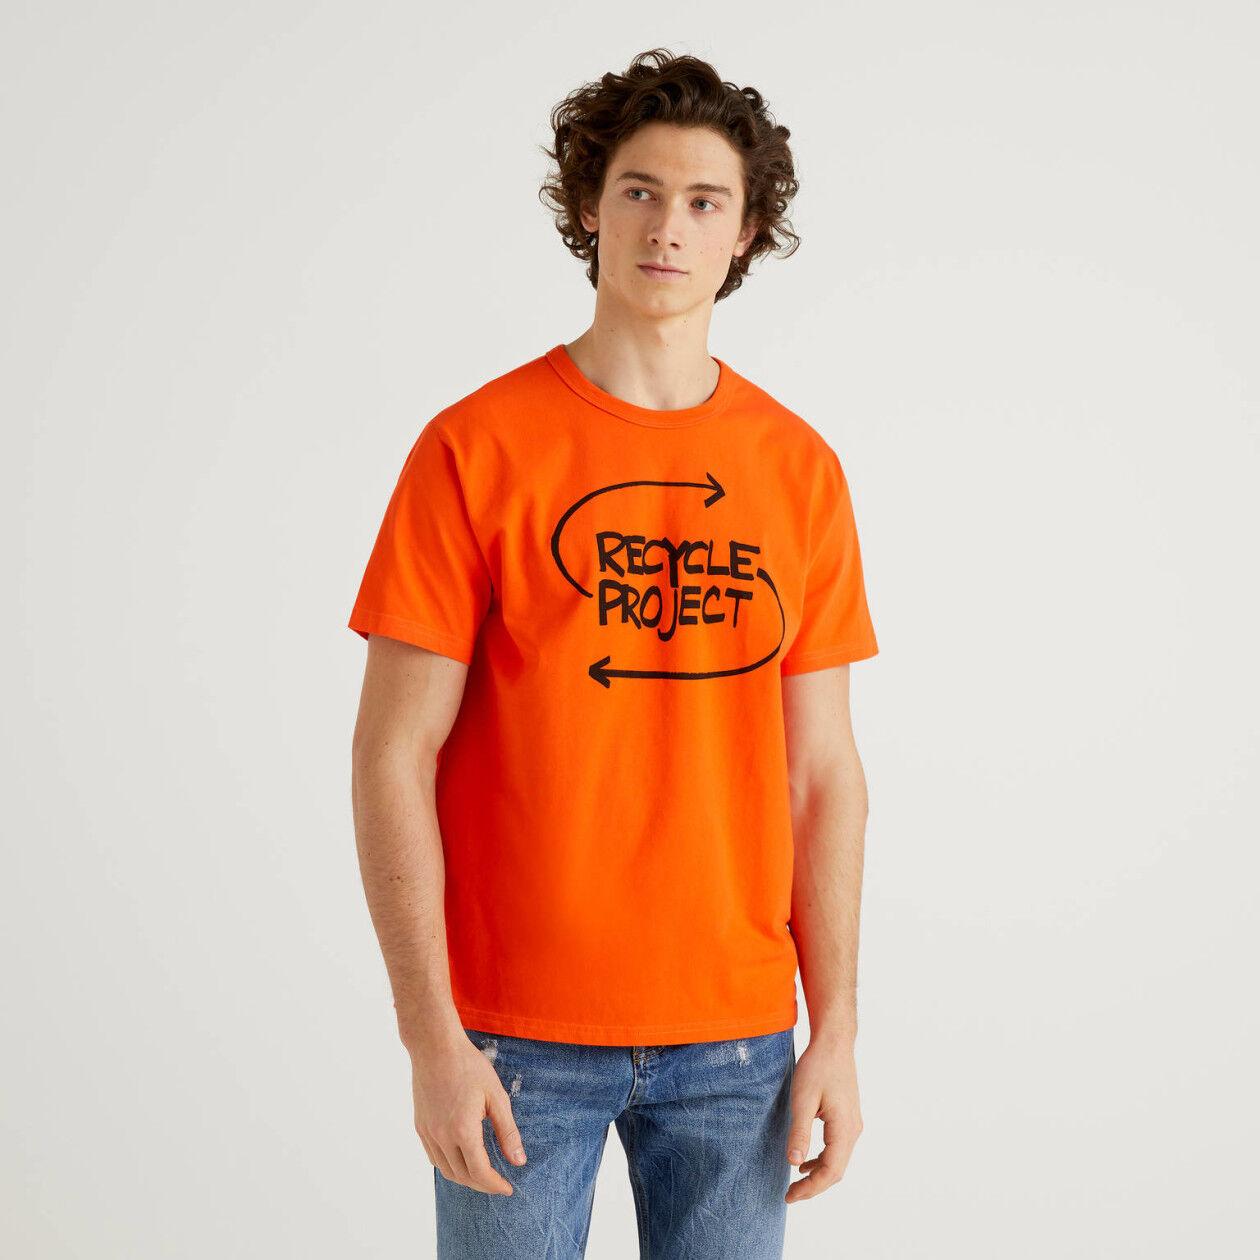 100% organic cotton t-shirt with print